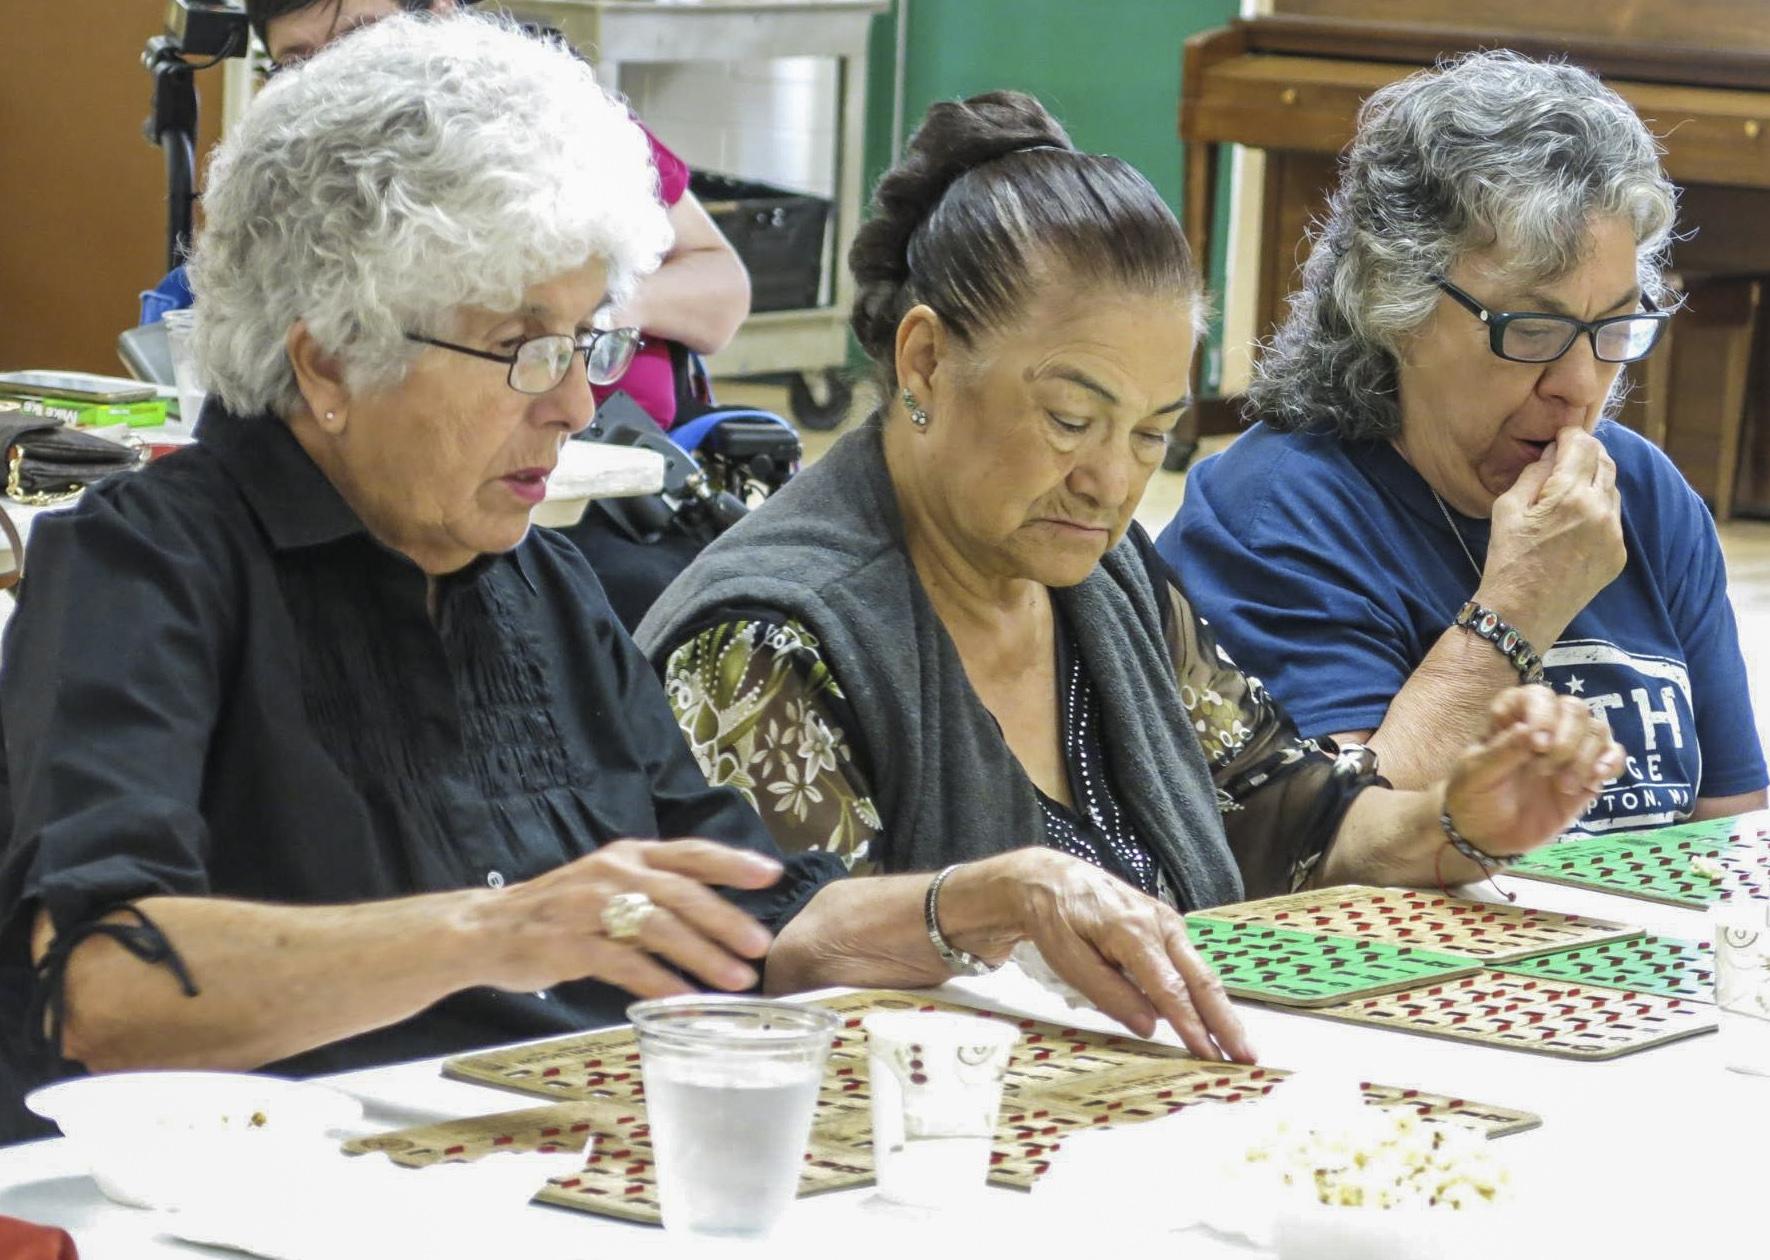 Photo: Colorado heat and health 3 | Playing bingo